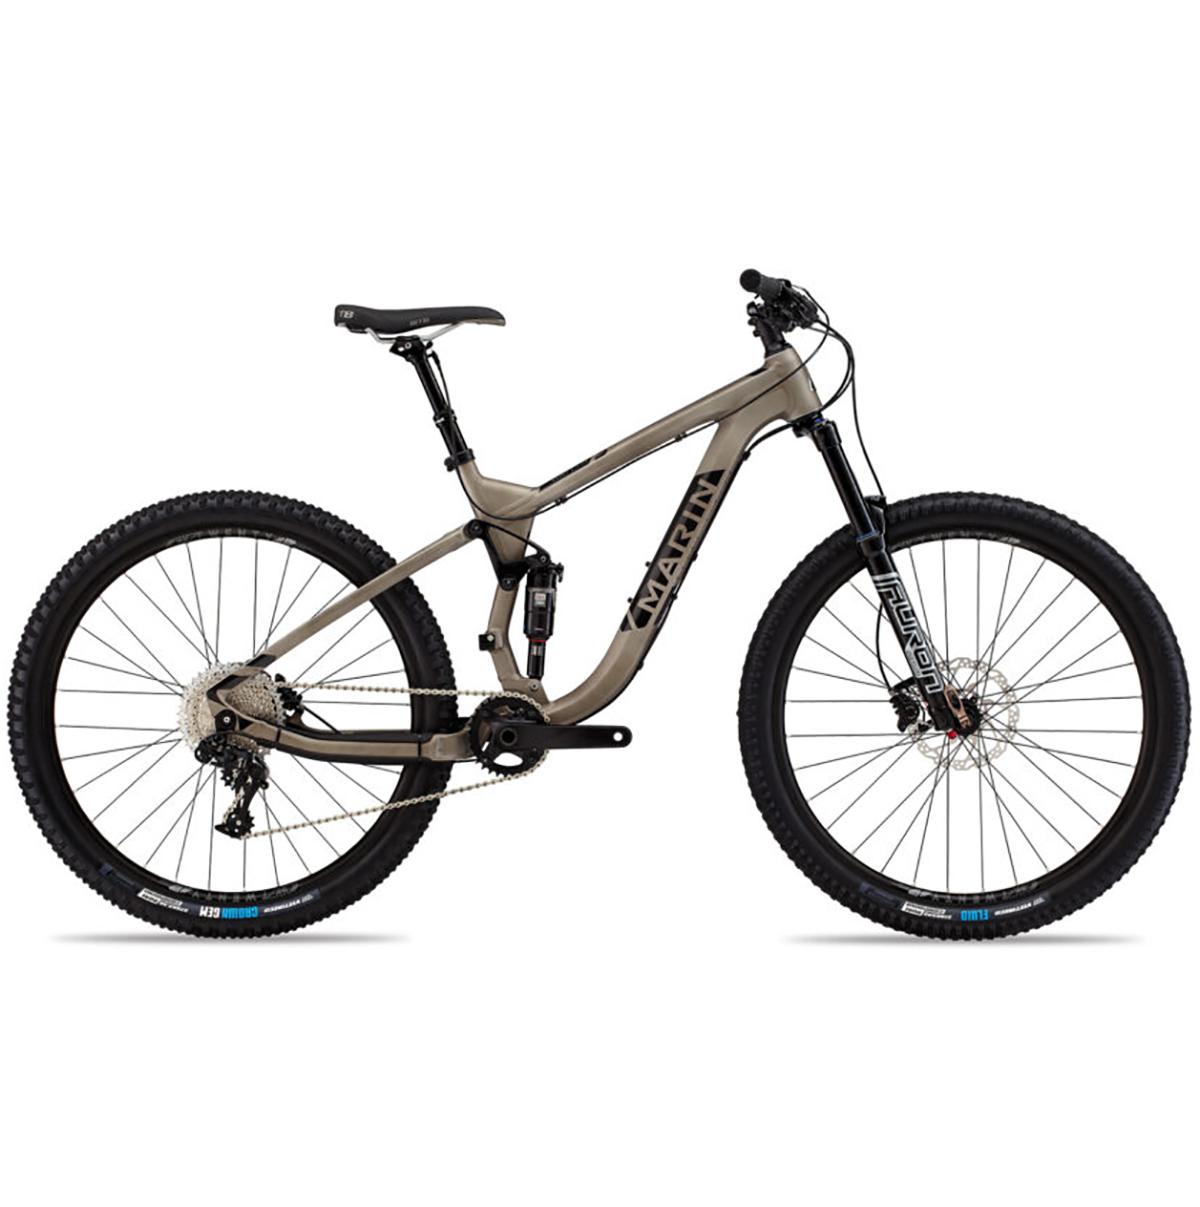 Marin Mount Vision 6 Mountain Bike - 2016